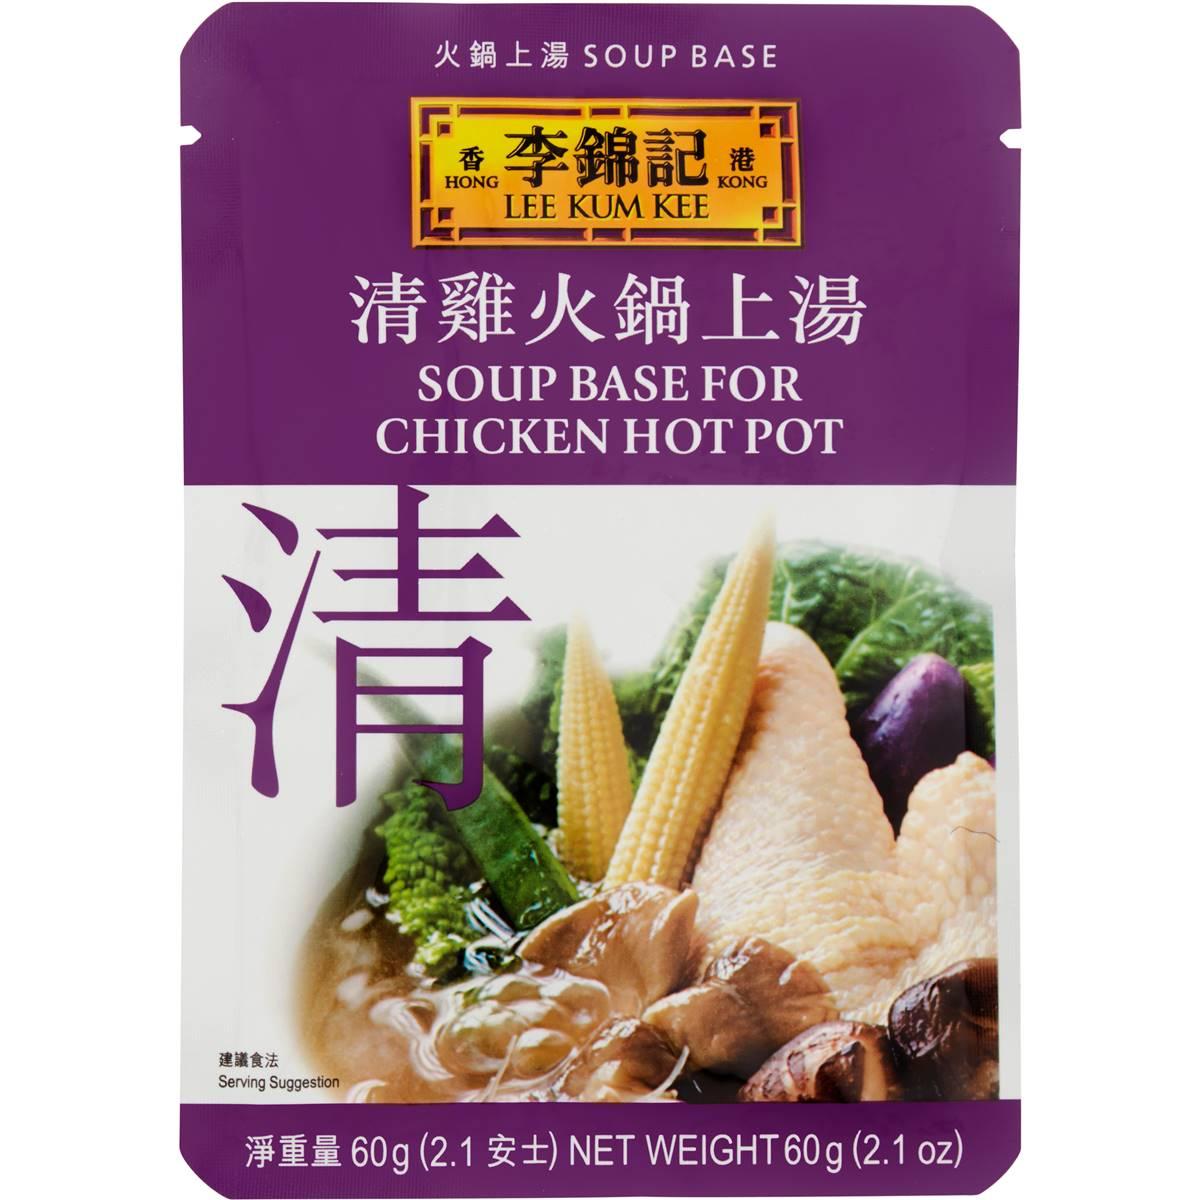 Lee Kum Kee Soup Base For Chicken Hot Pot Chicken Soup Hot Pot